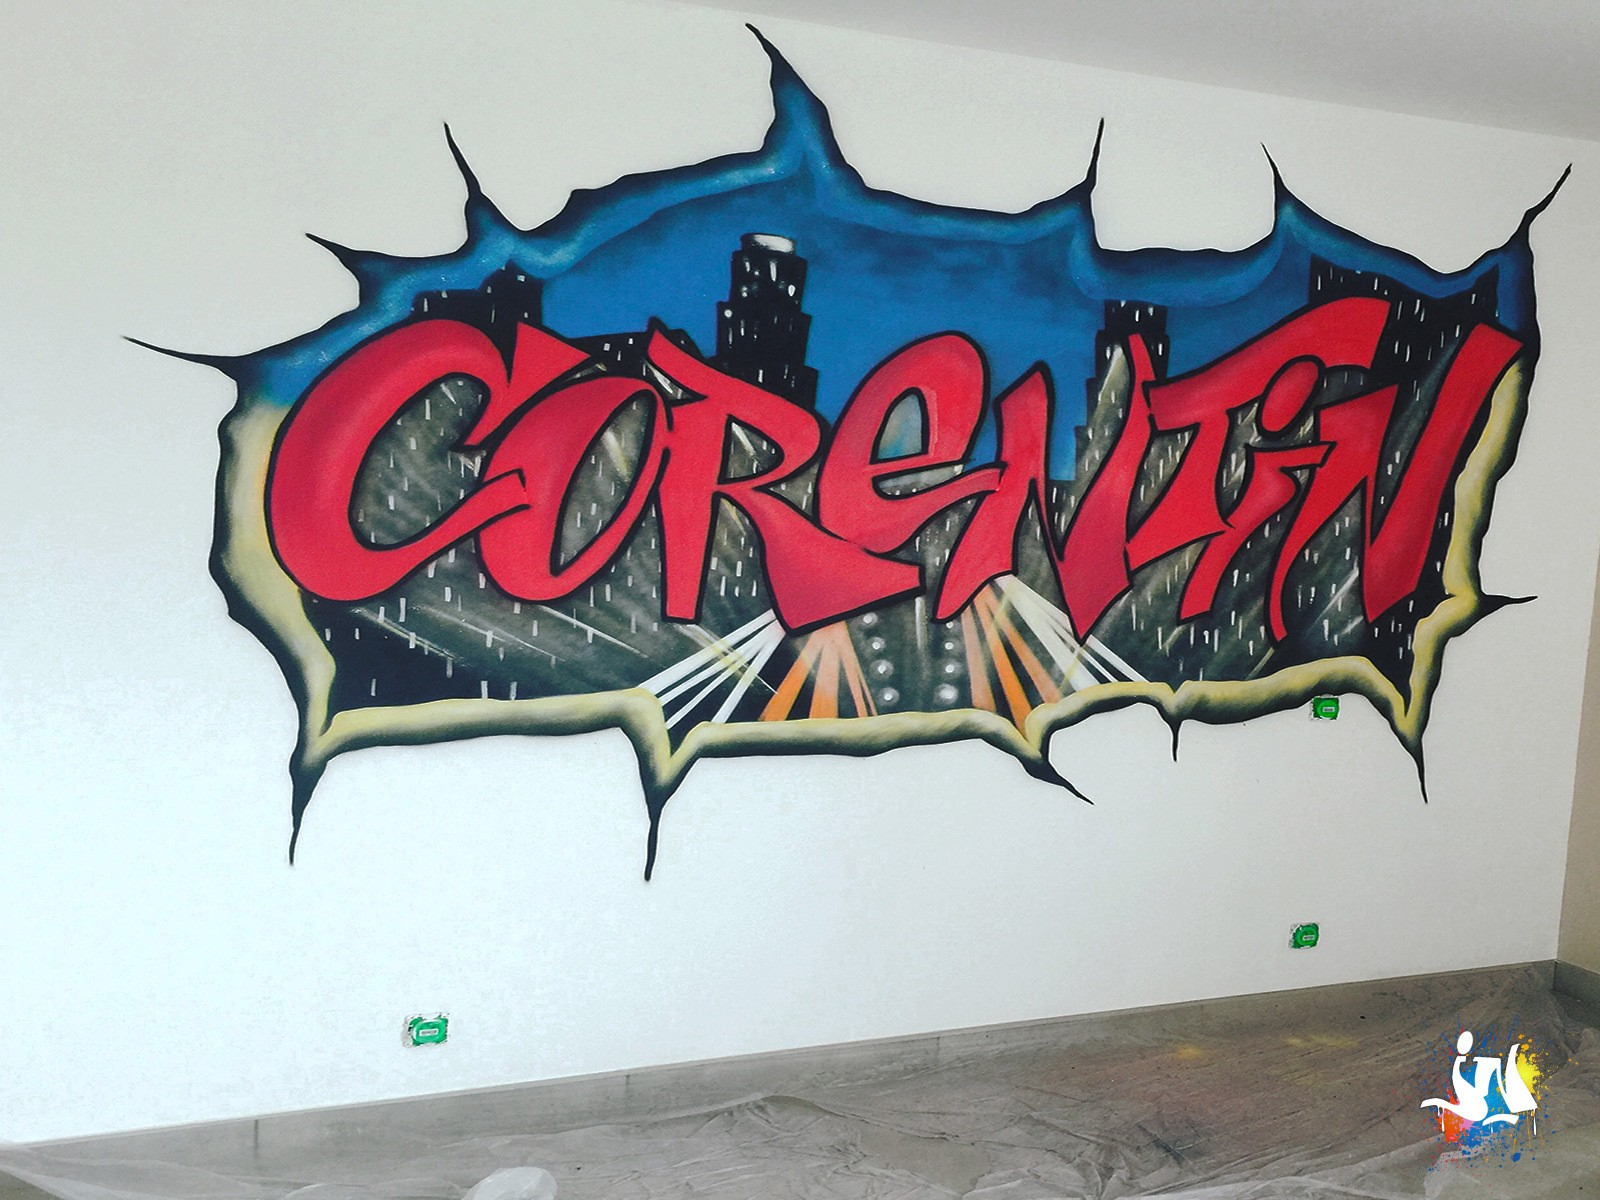 diff rents pr noms en graffiti dans les chambres d 39 enfants et ados. Black Bedroom Furniture Sets. Home Design Ideas